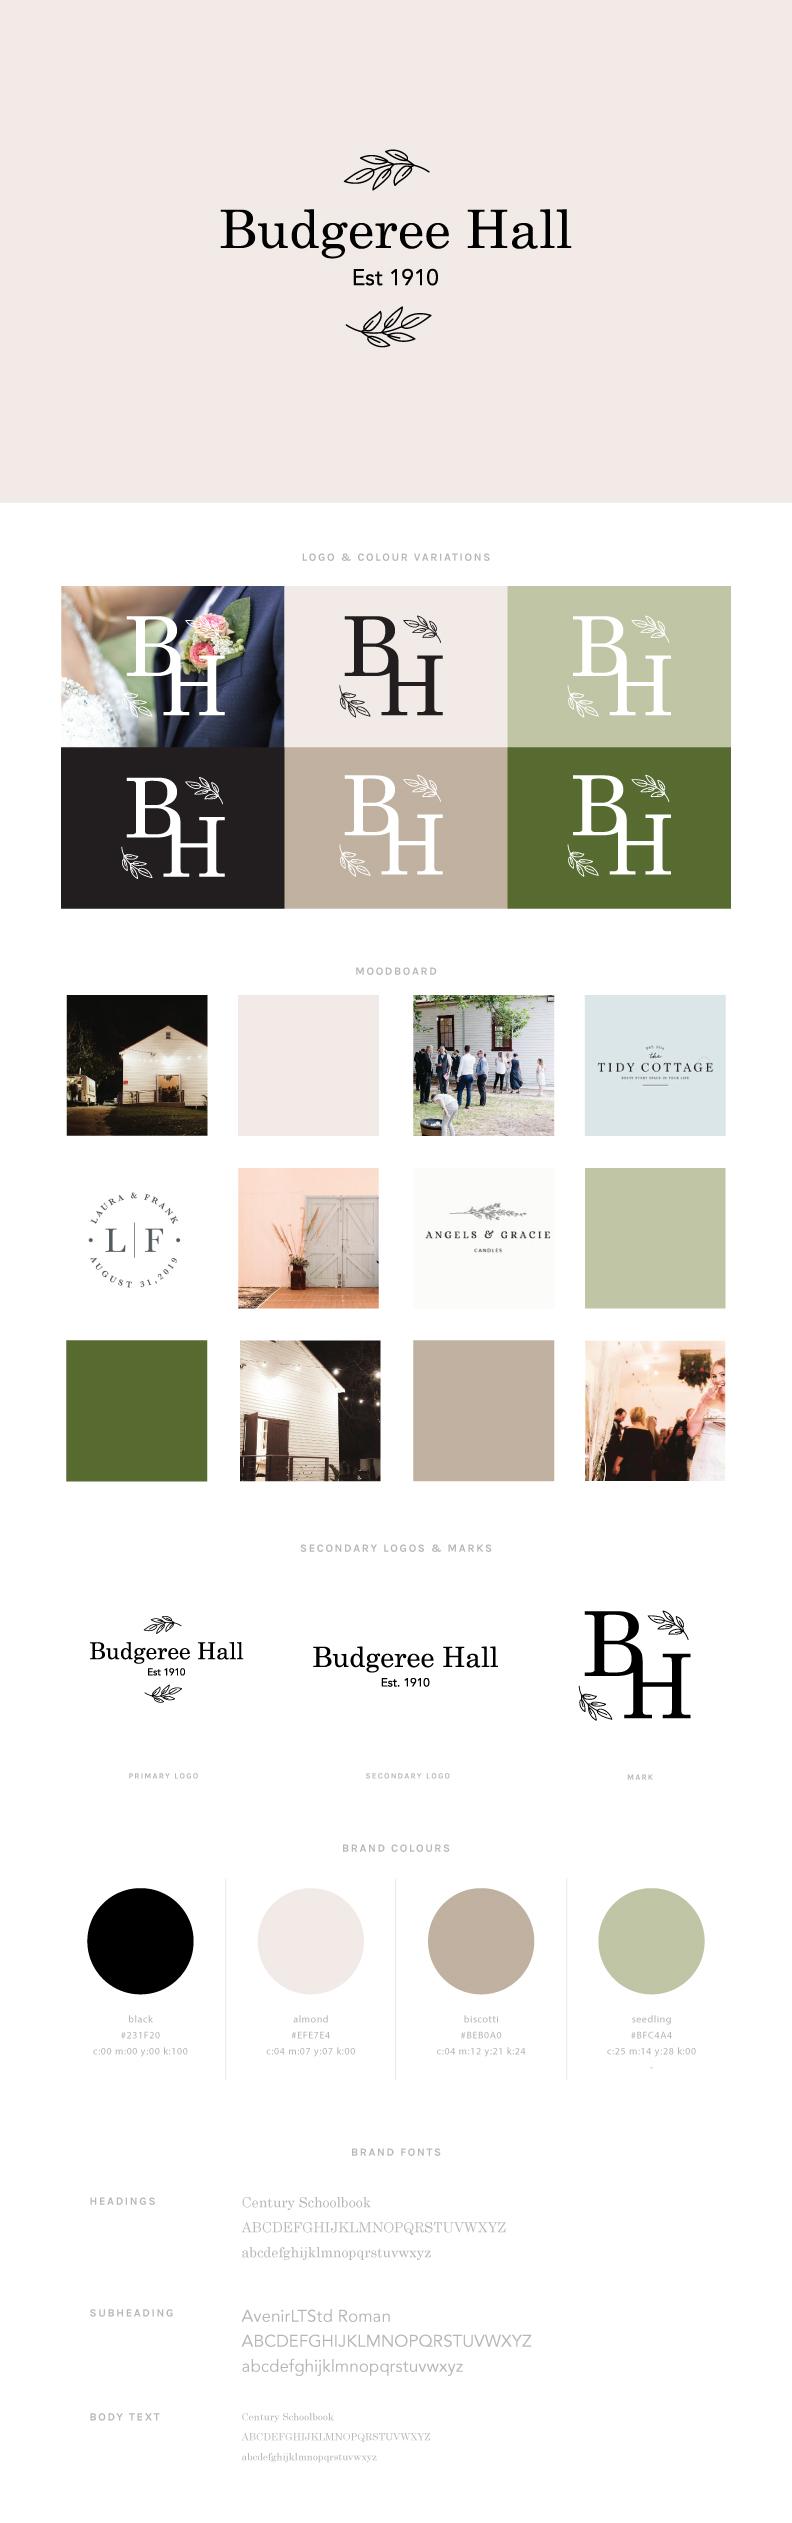 Budgereehall_branding_portfolio